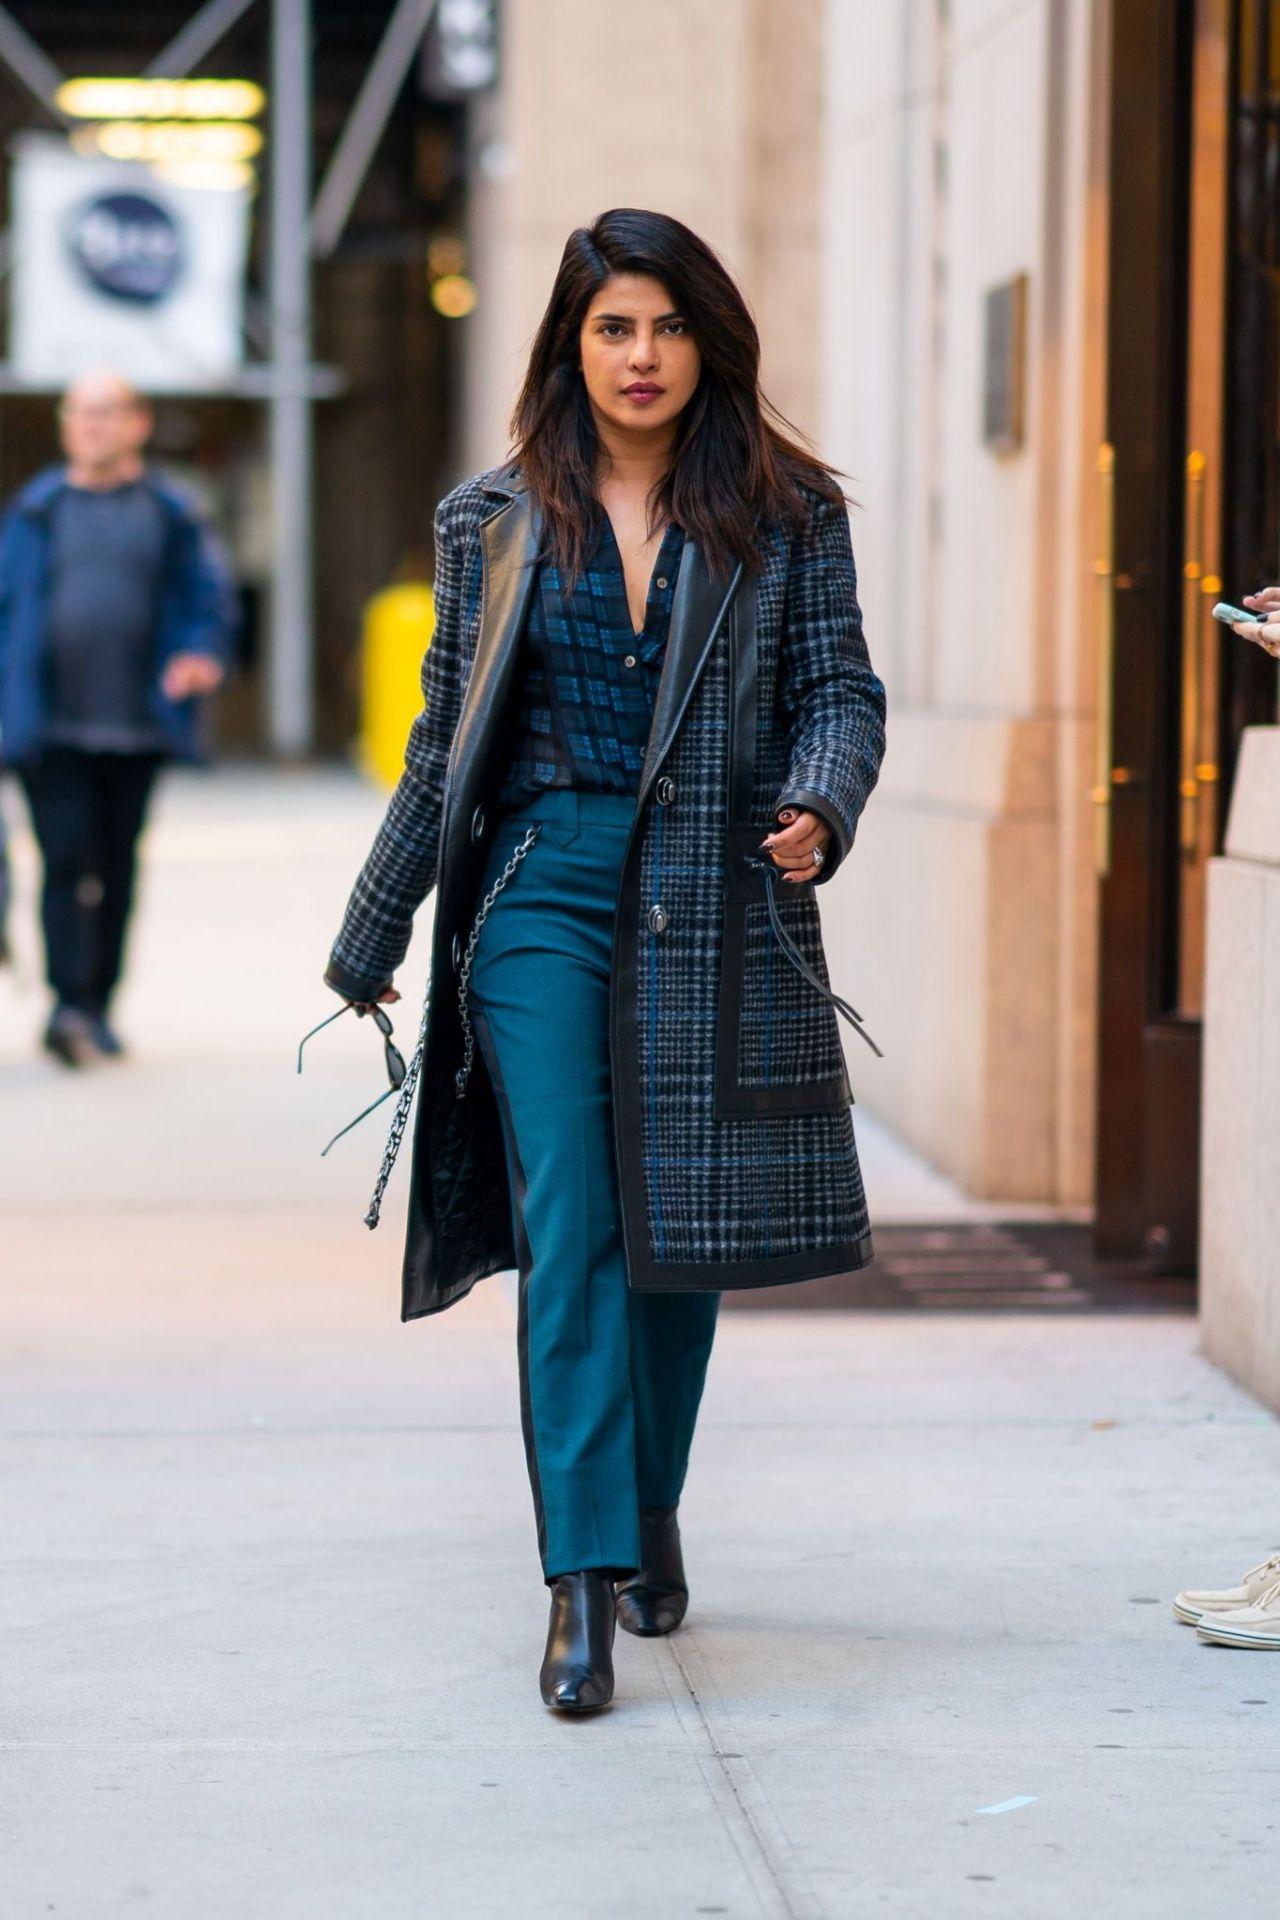 Priyanka Chopra Is Stylish 04 06 2019